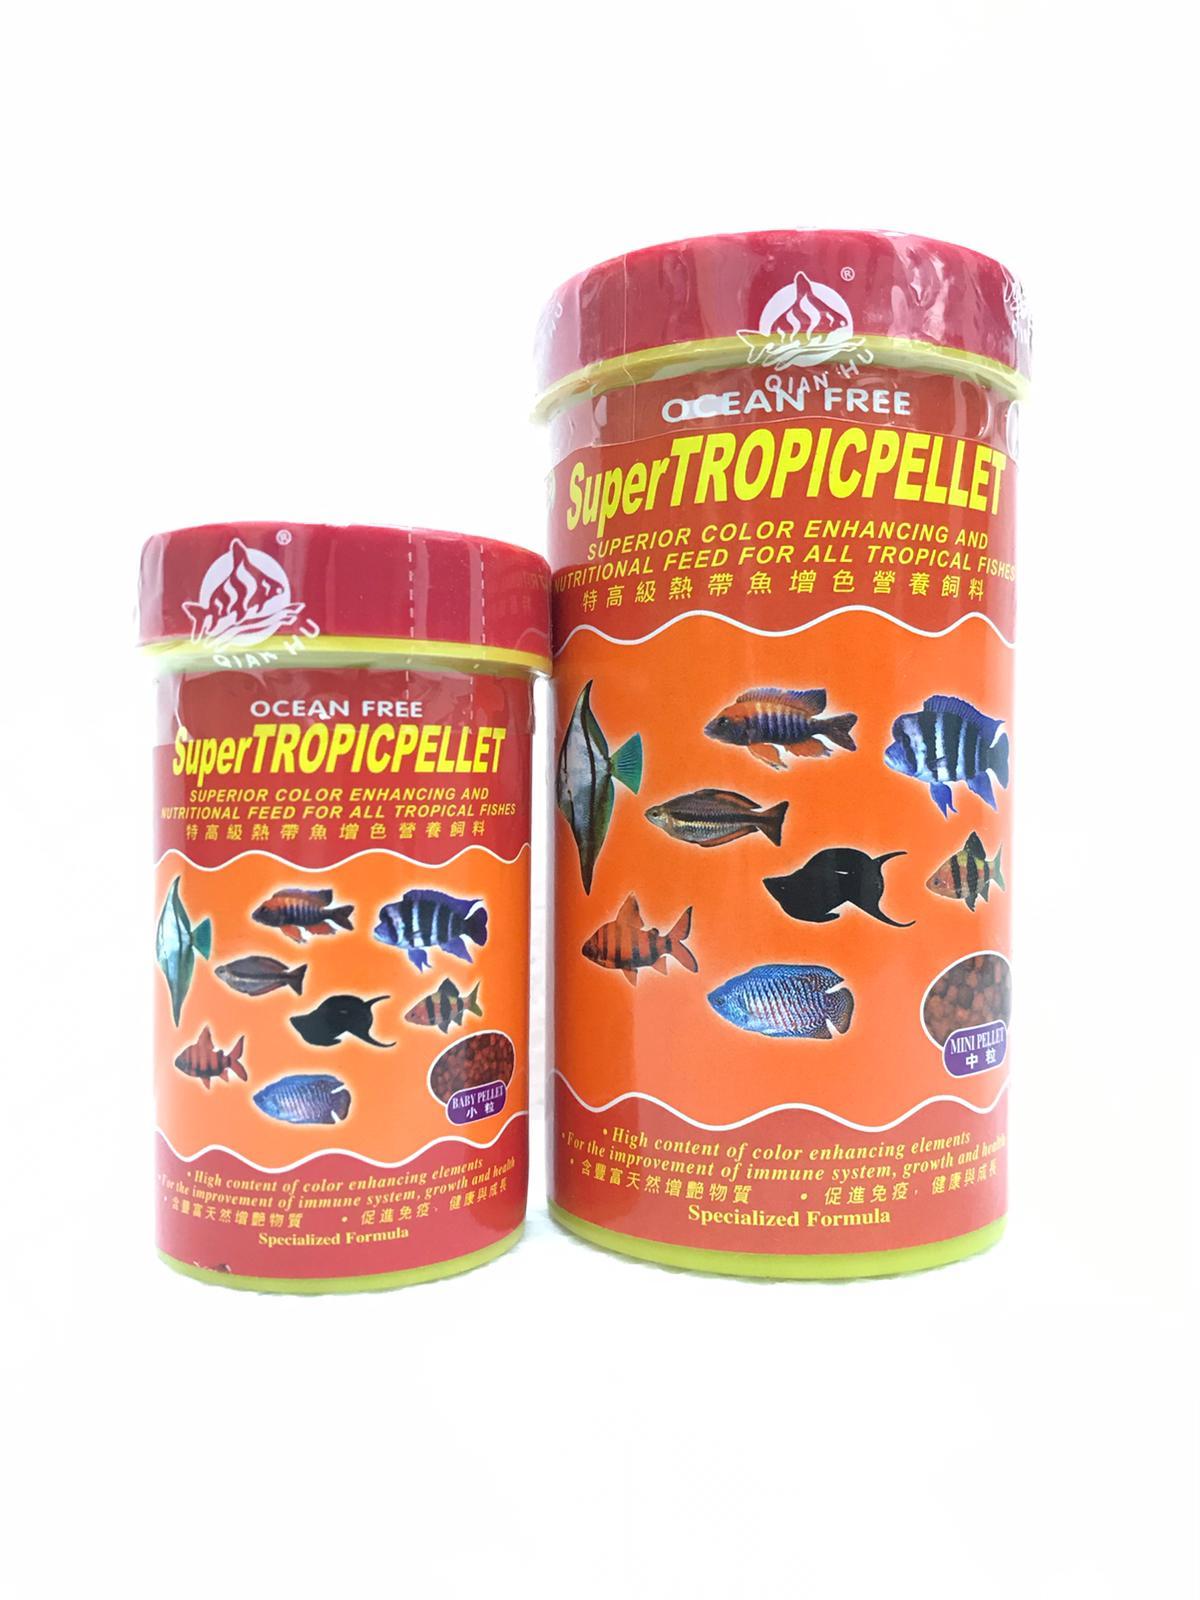 OF Super Tropicpellet Superior Color Enhancing